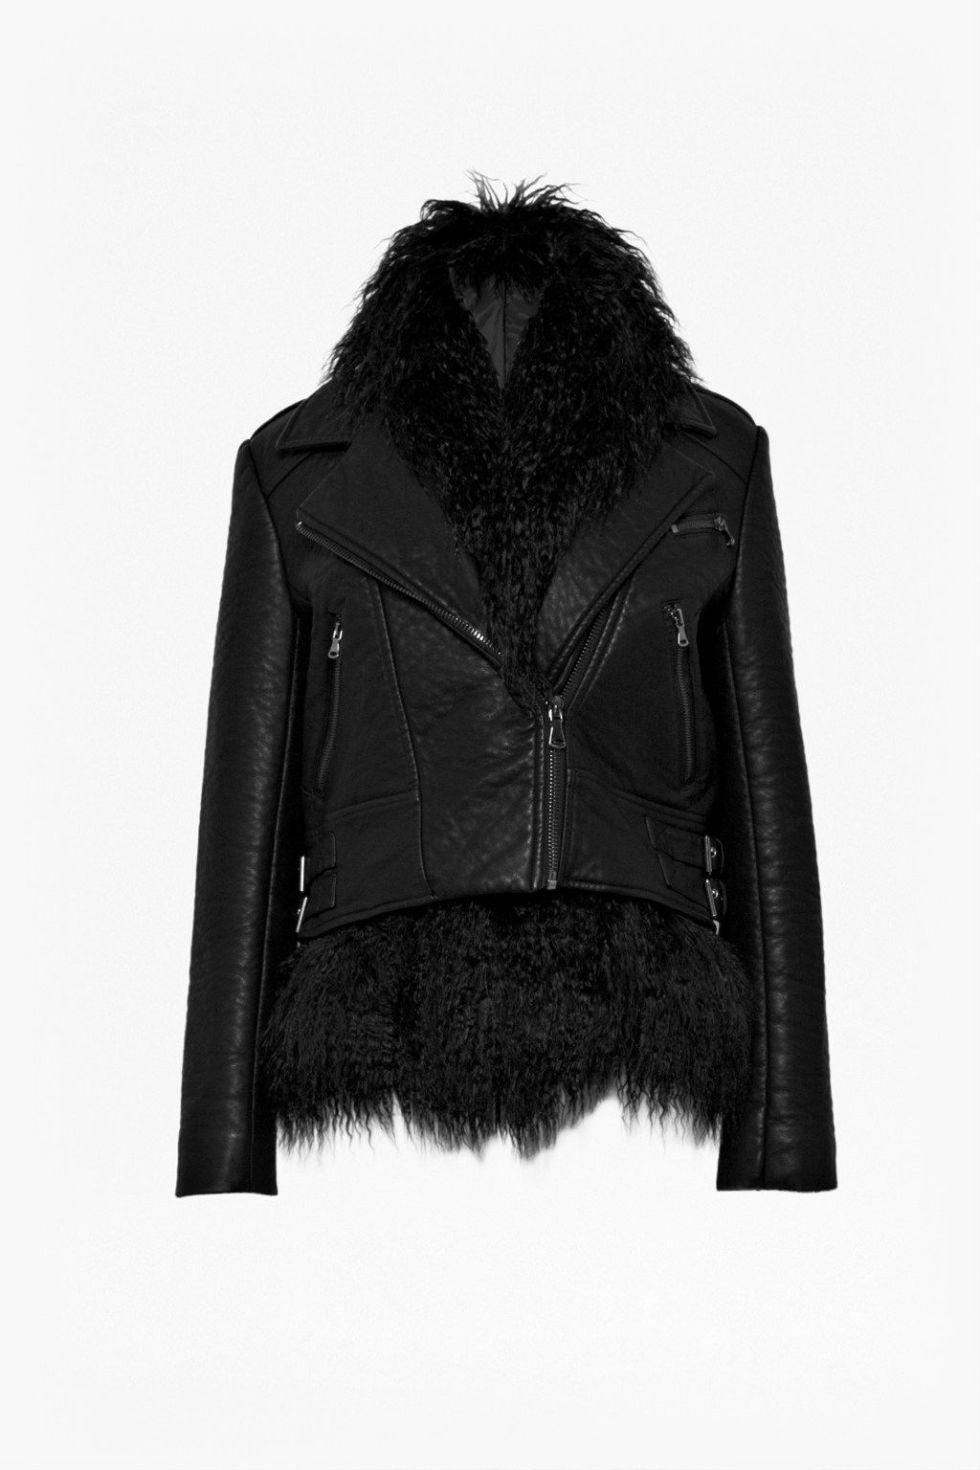 11 Trendy Faux Fur Coats - Faux Fur Winter Coats and Jackets We Love